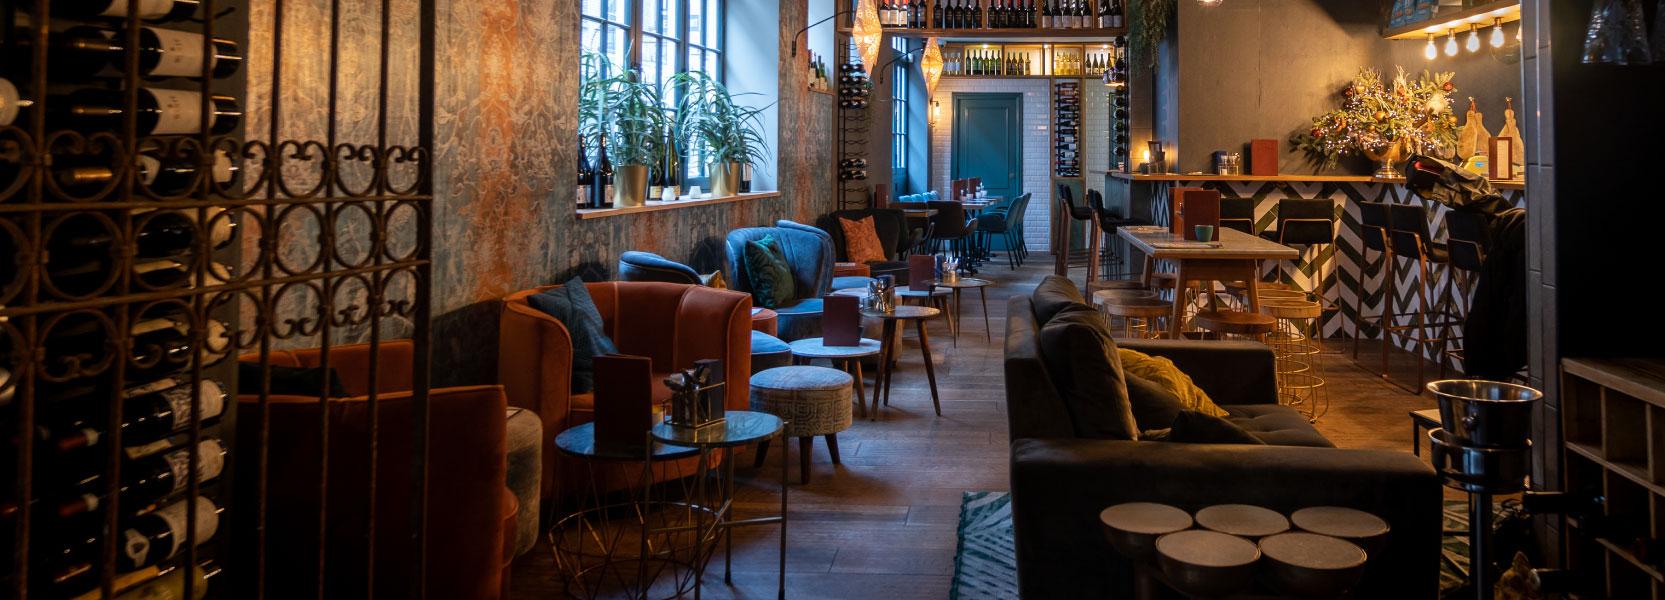 wijnbar-shiraz-amsterdam-januari-2020